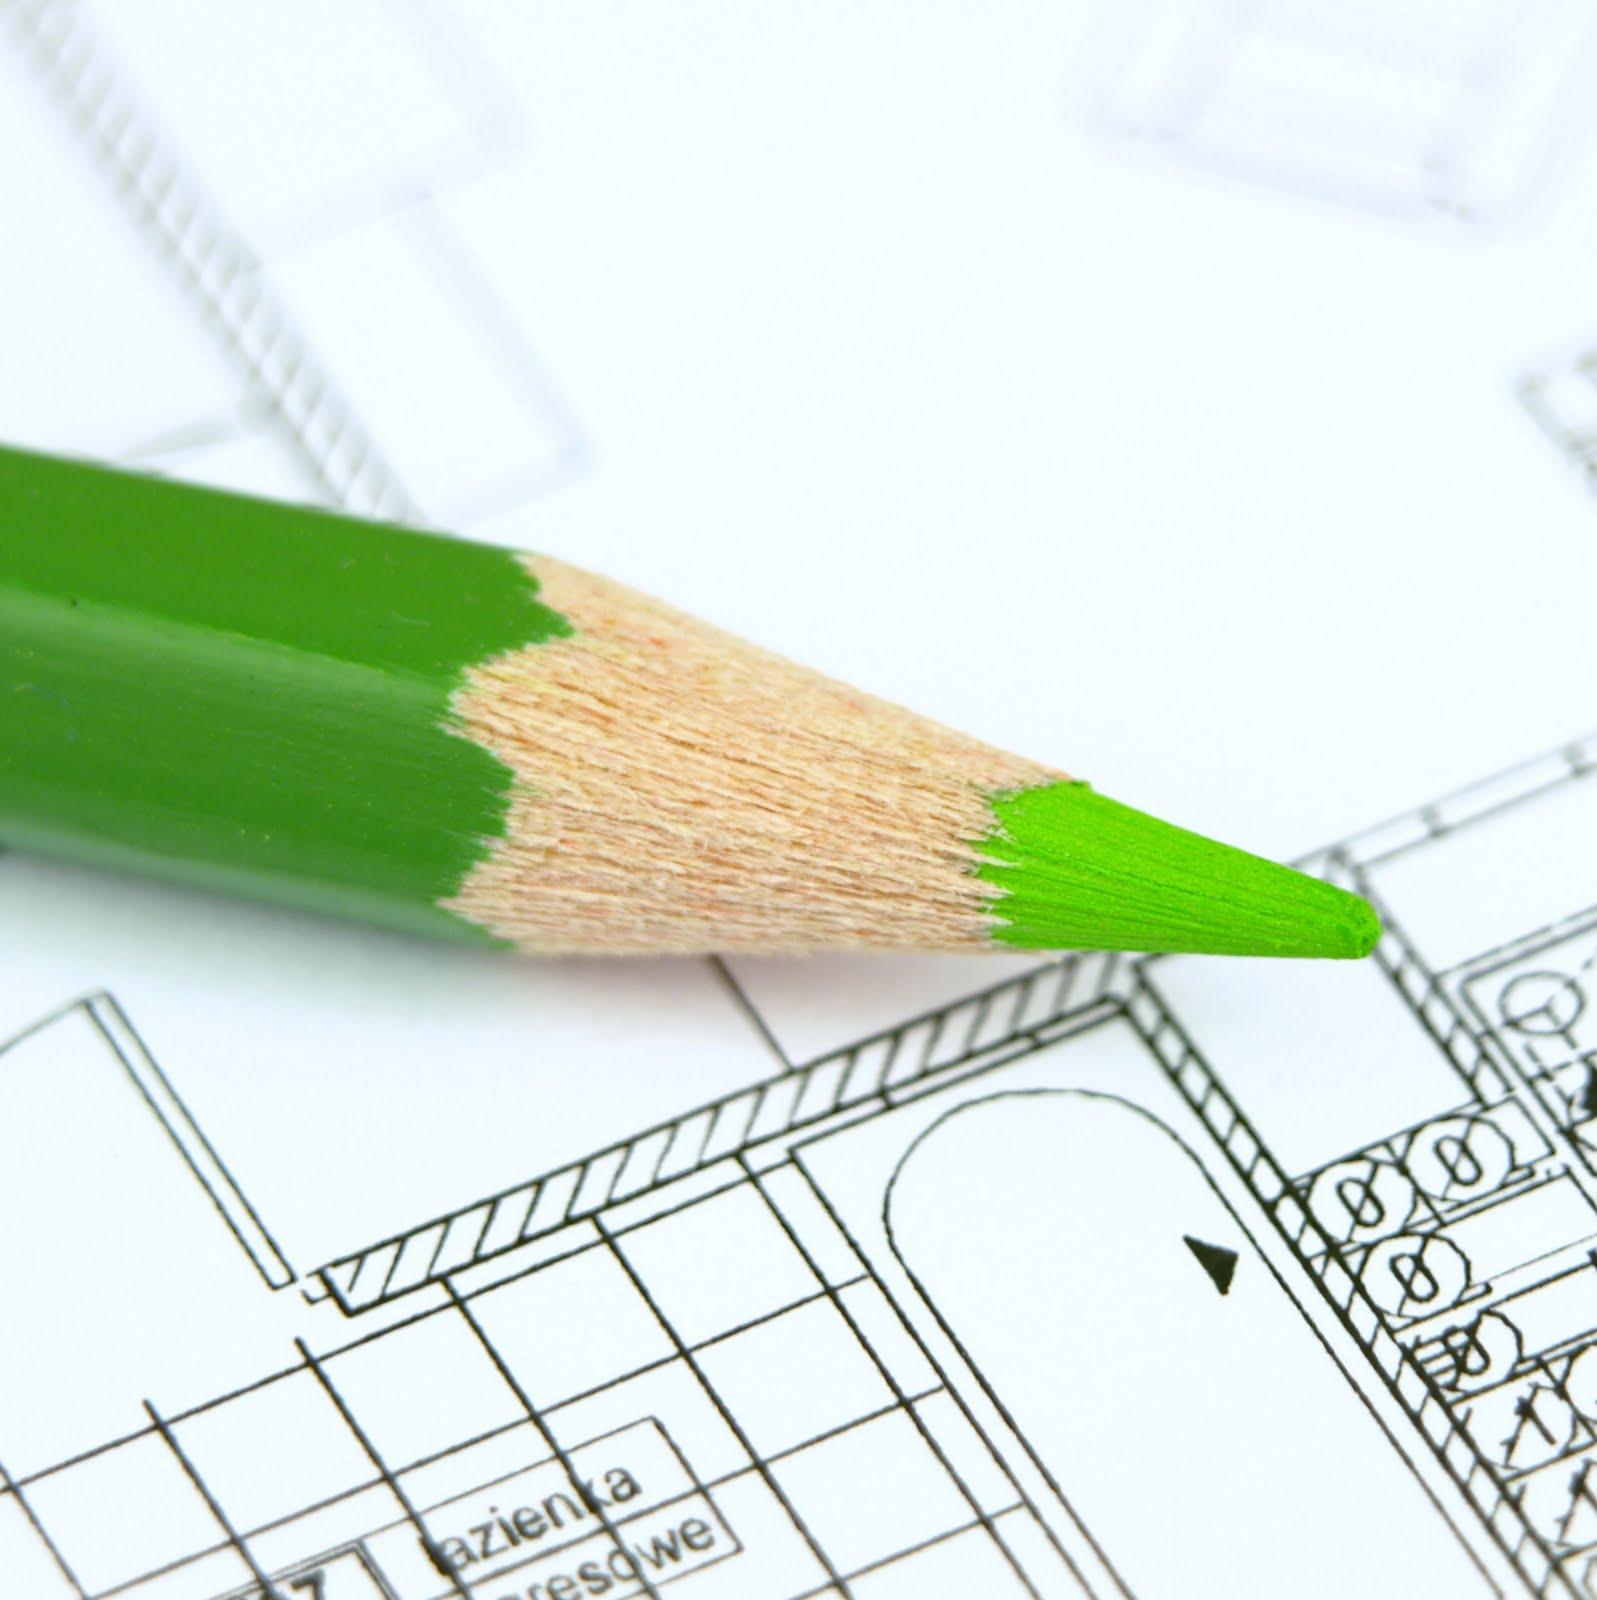 Grupoartema arquitectura for Obra arquitectonica definicion